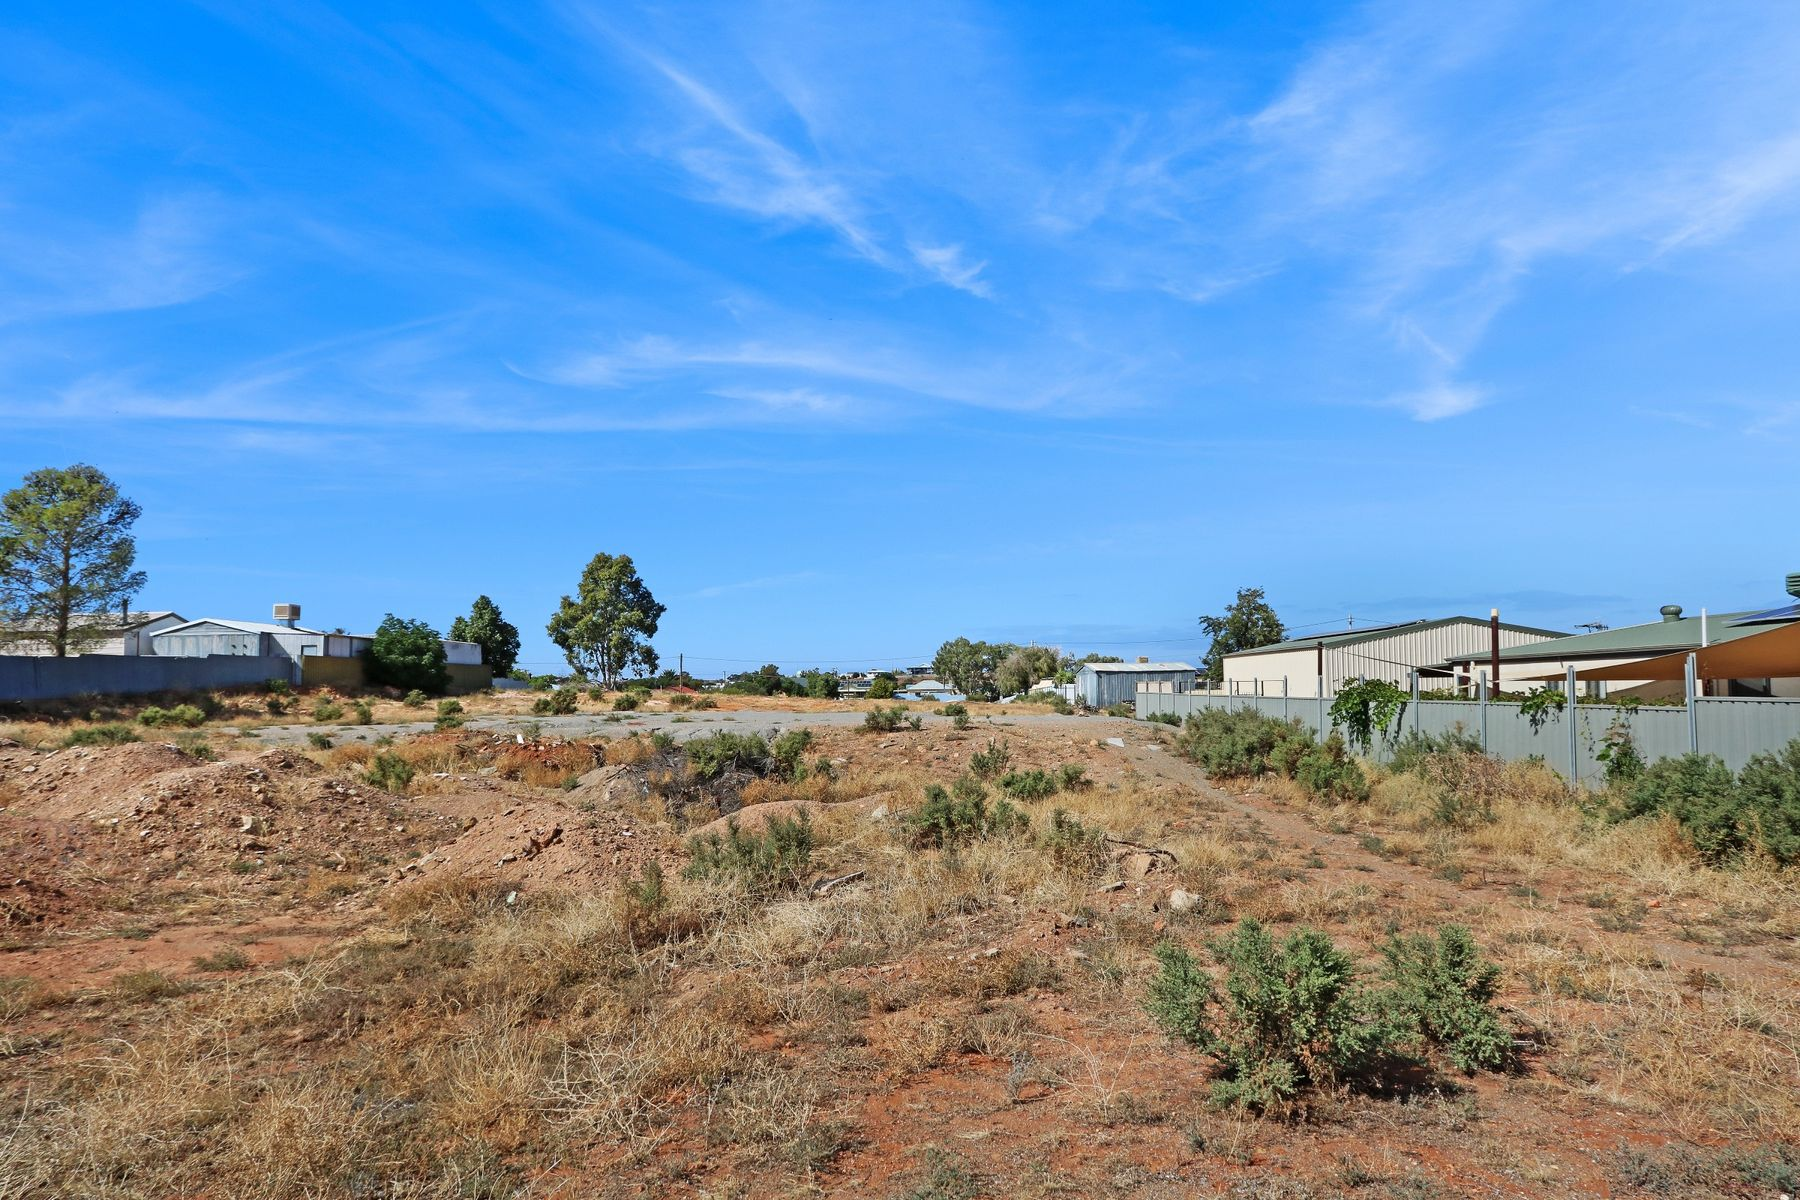 Lot 79 of 81 Wyman Street, Broken Hill, NSW 2880